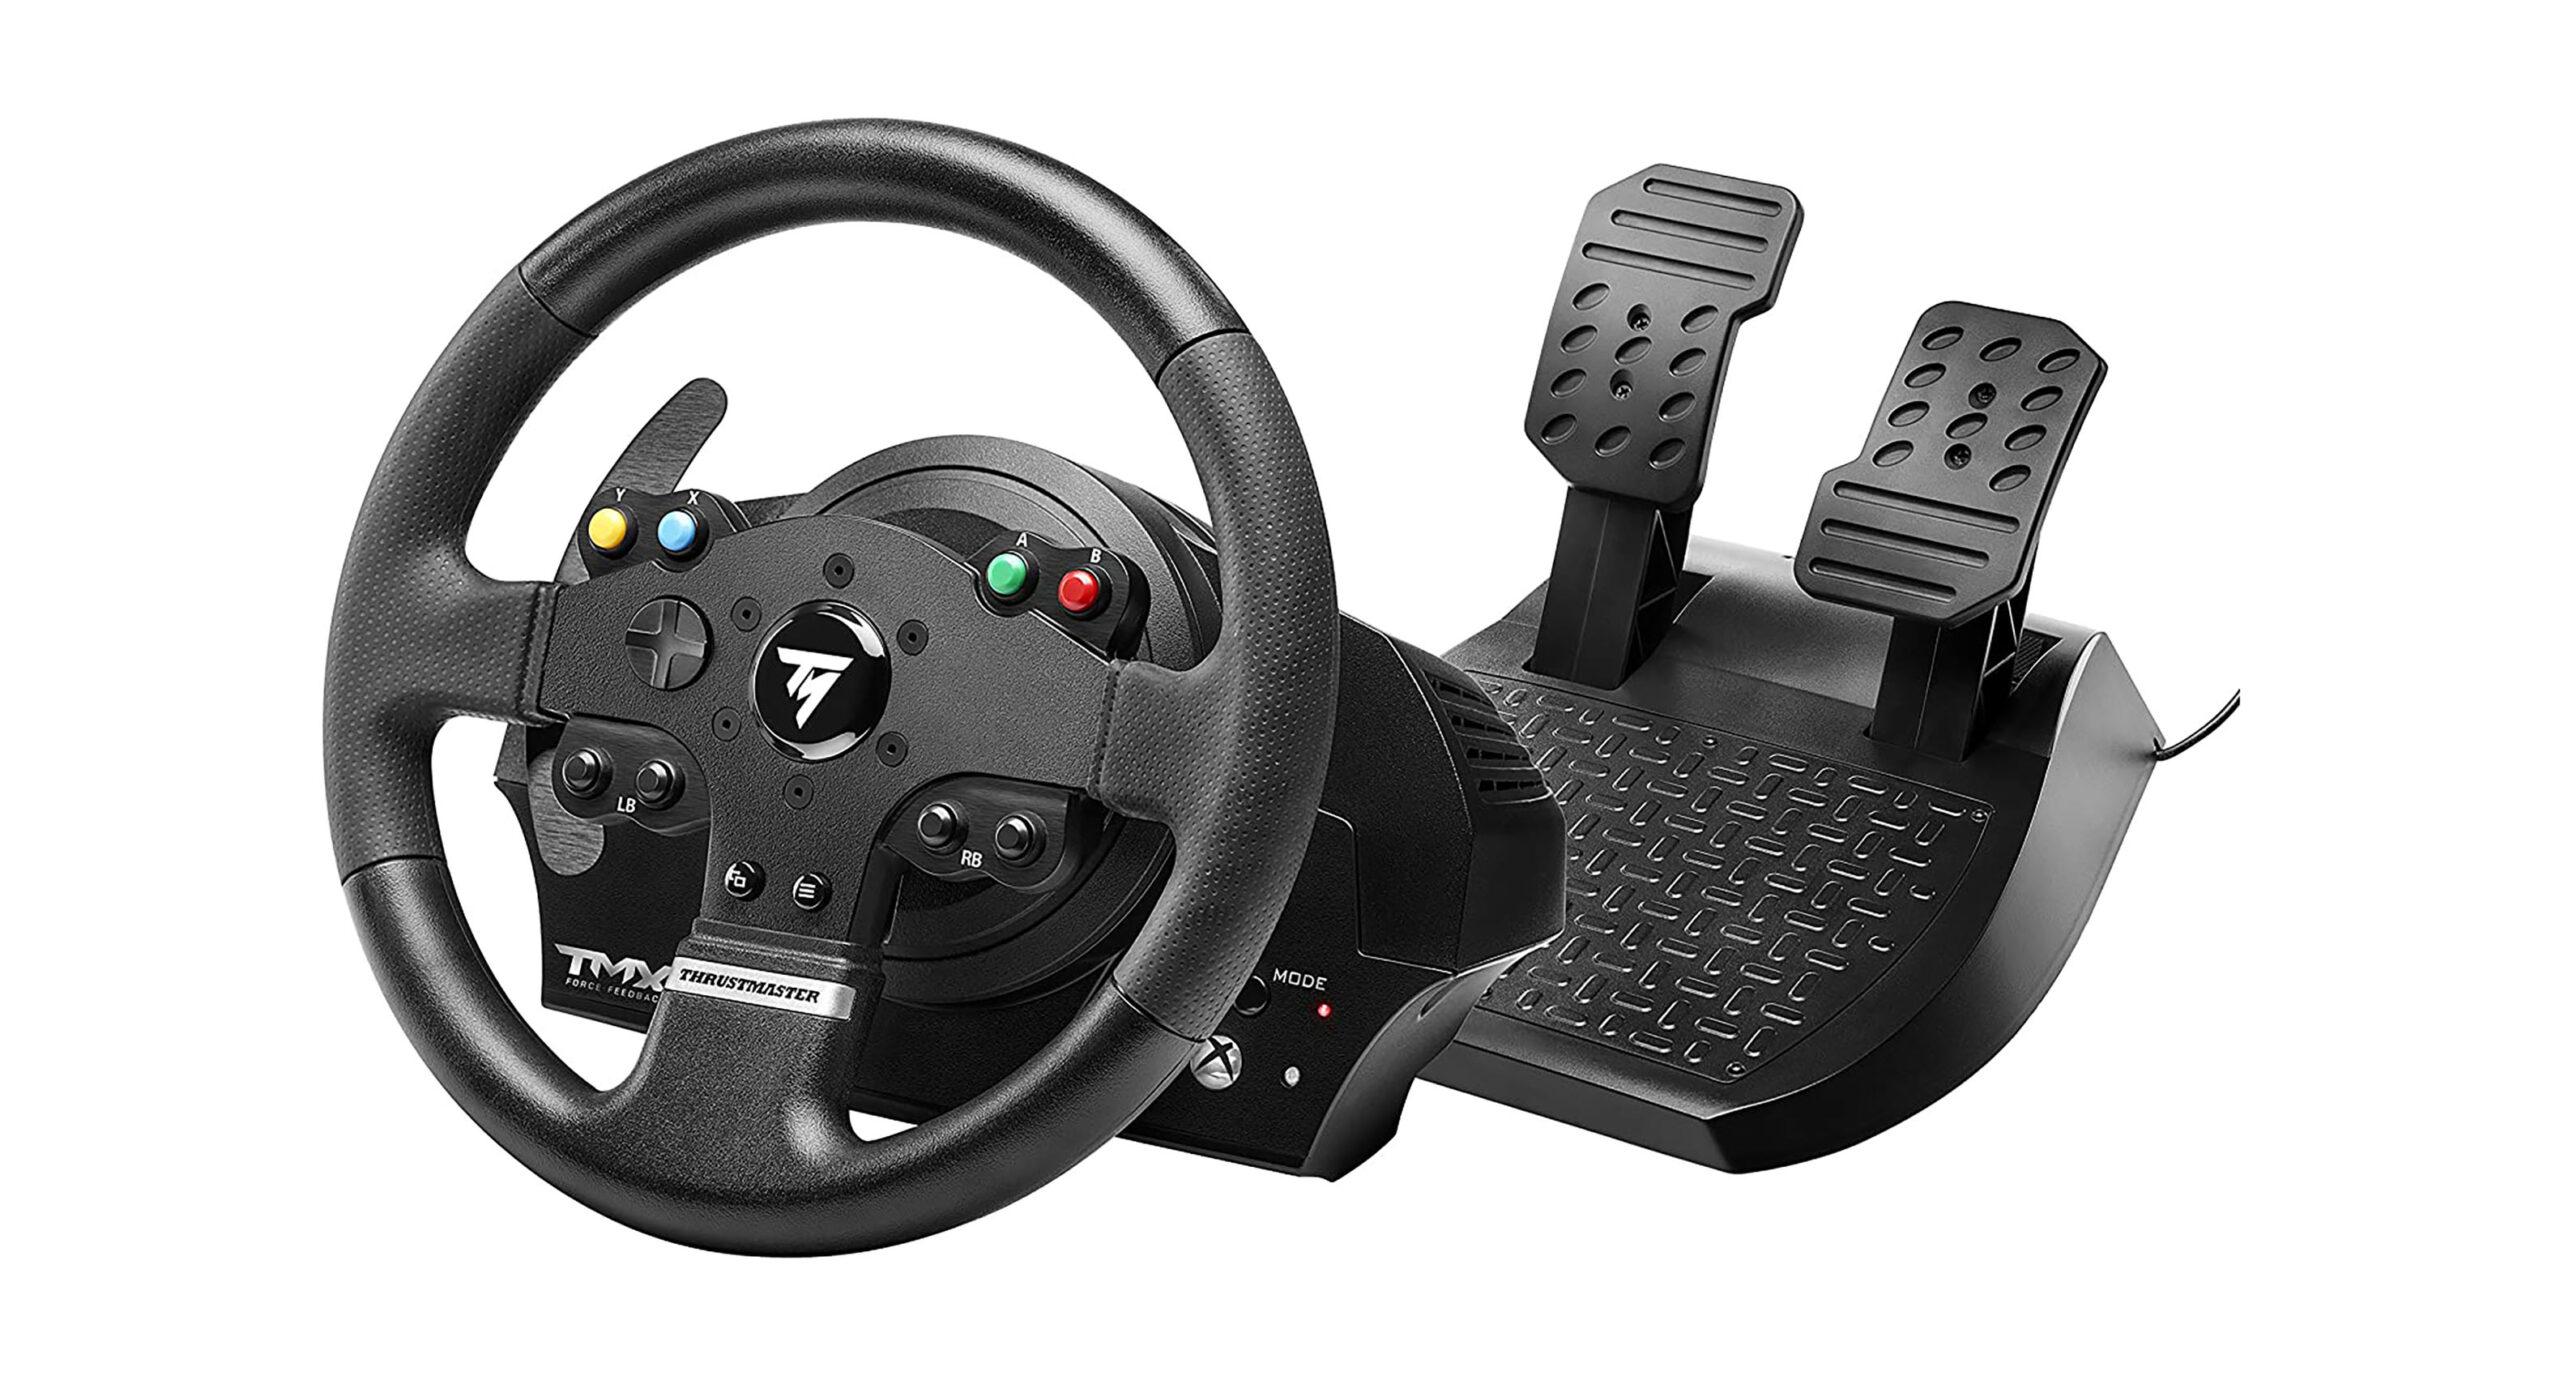 Thrustmaster racing wheel